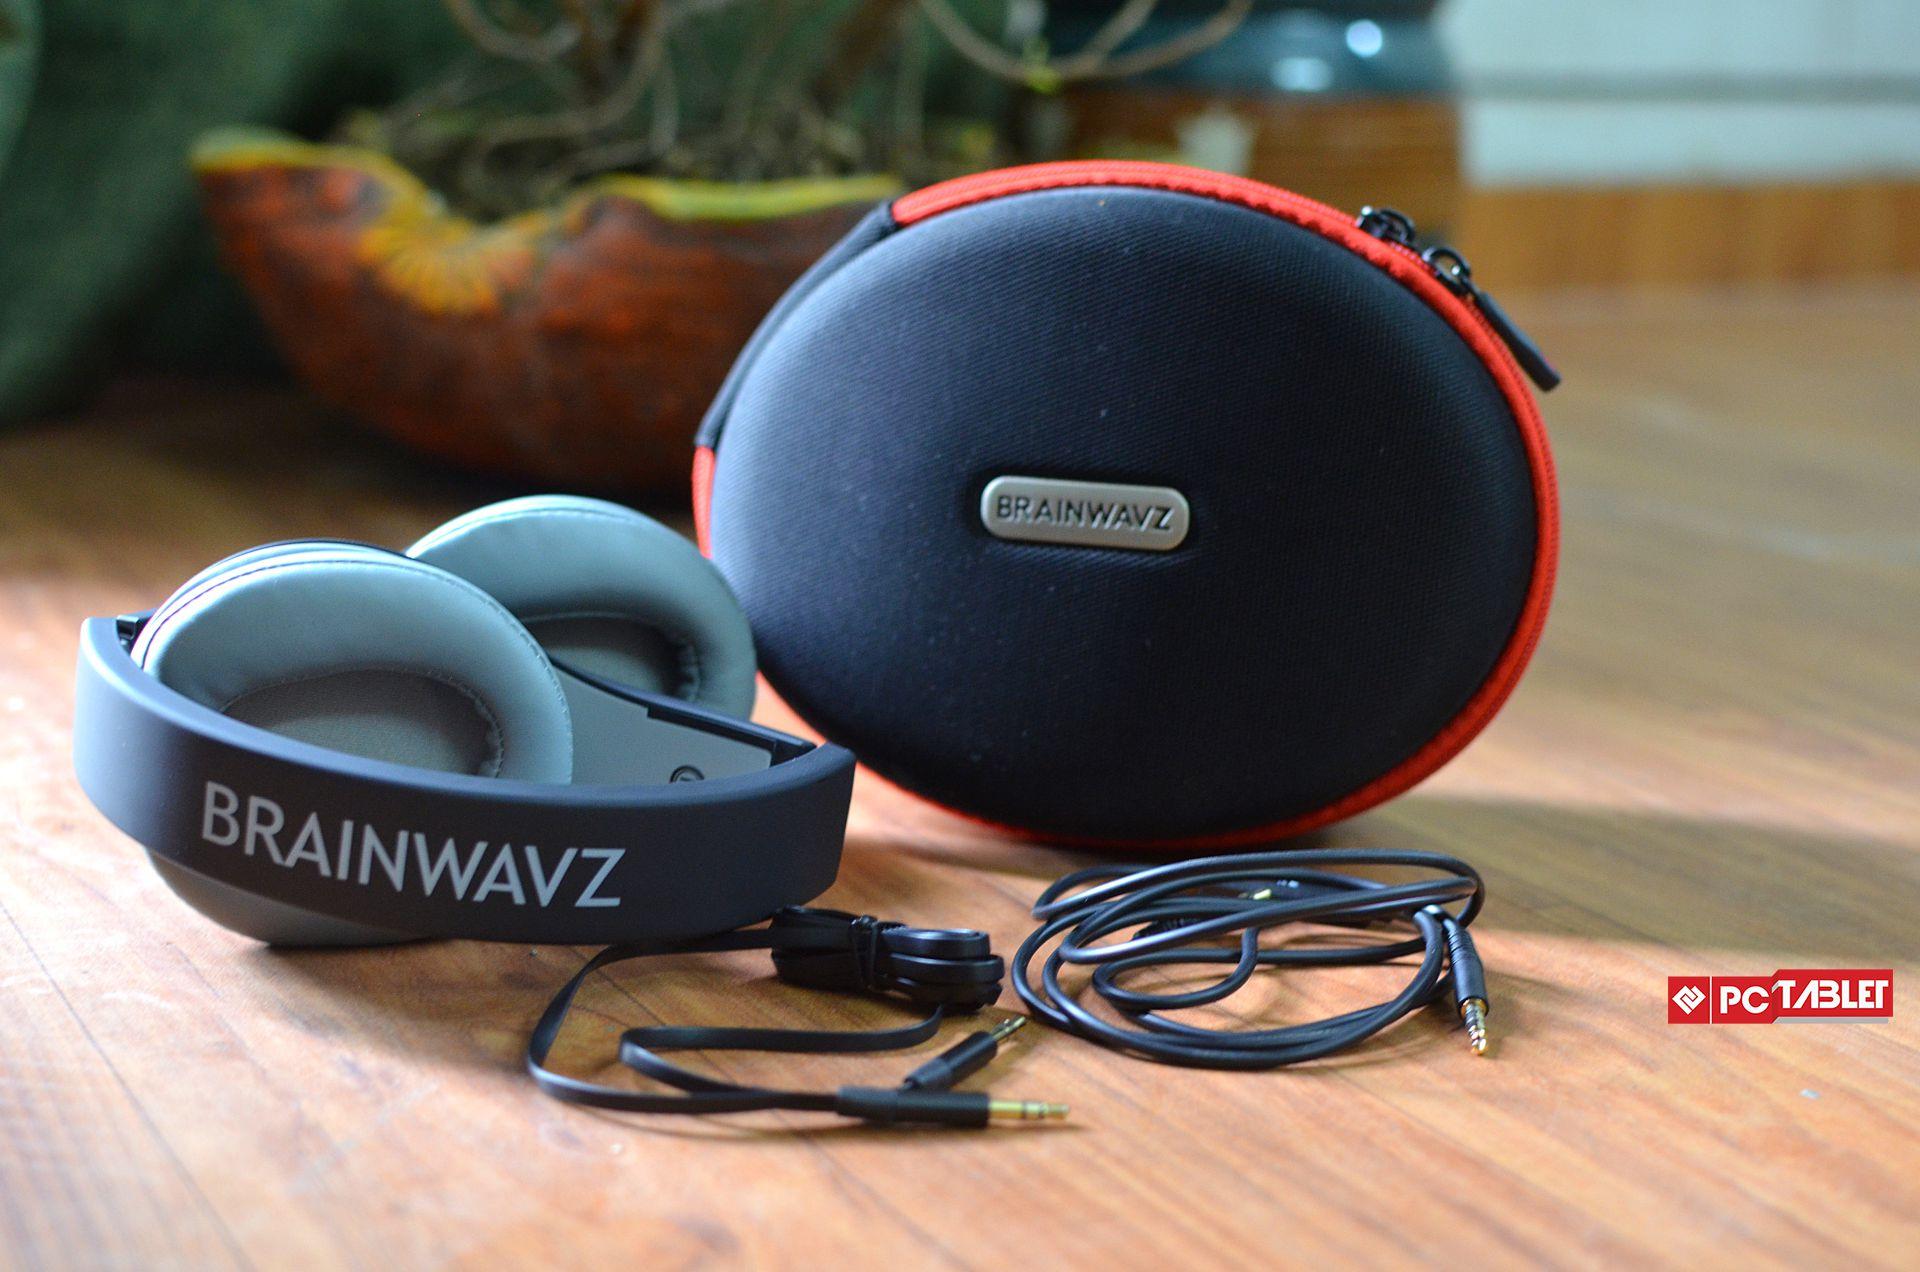 Brainwavz HM2